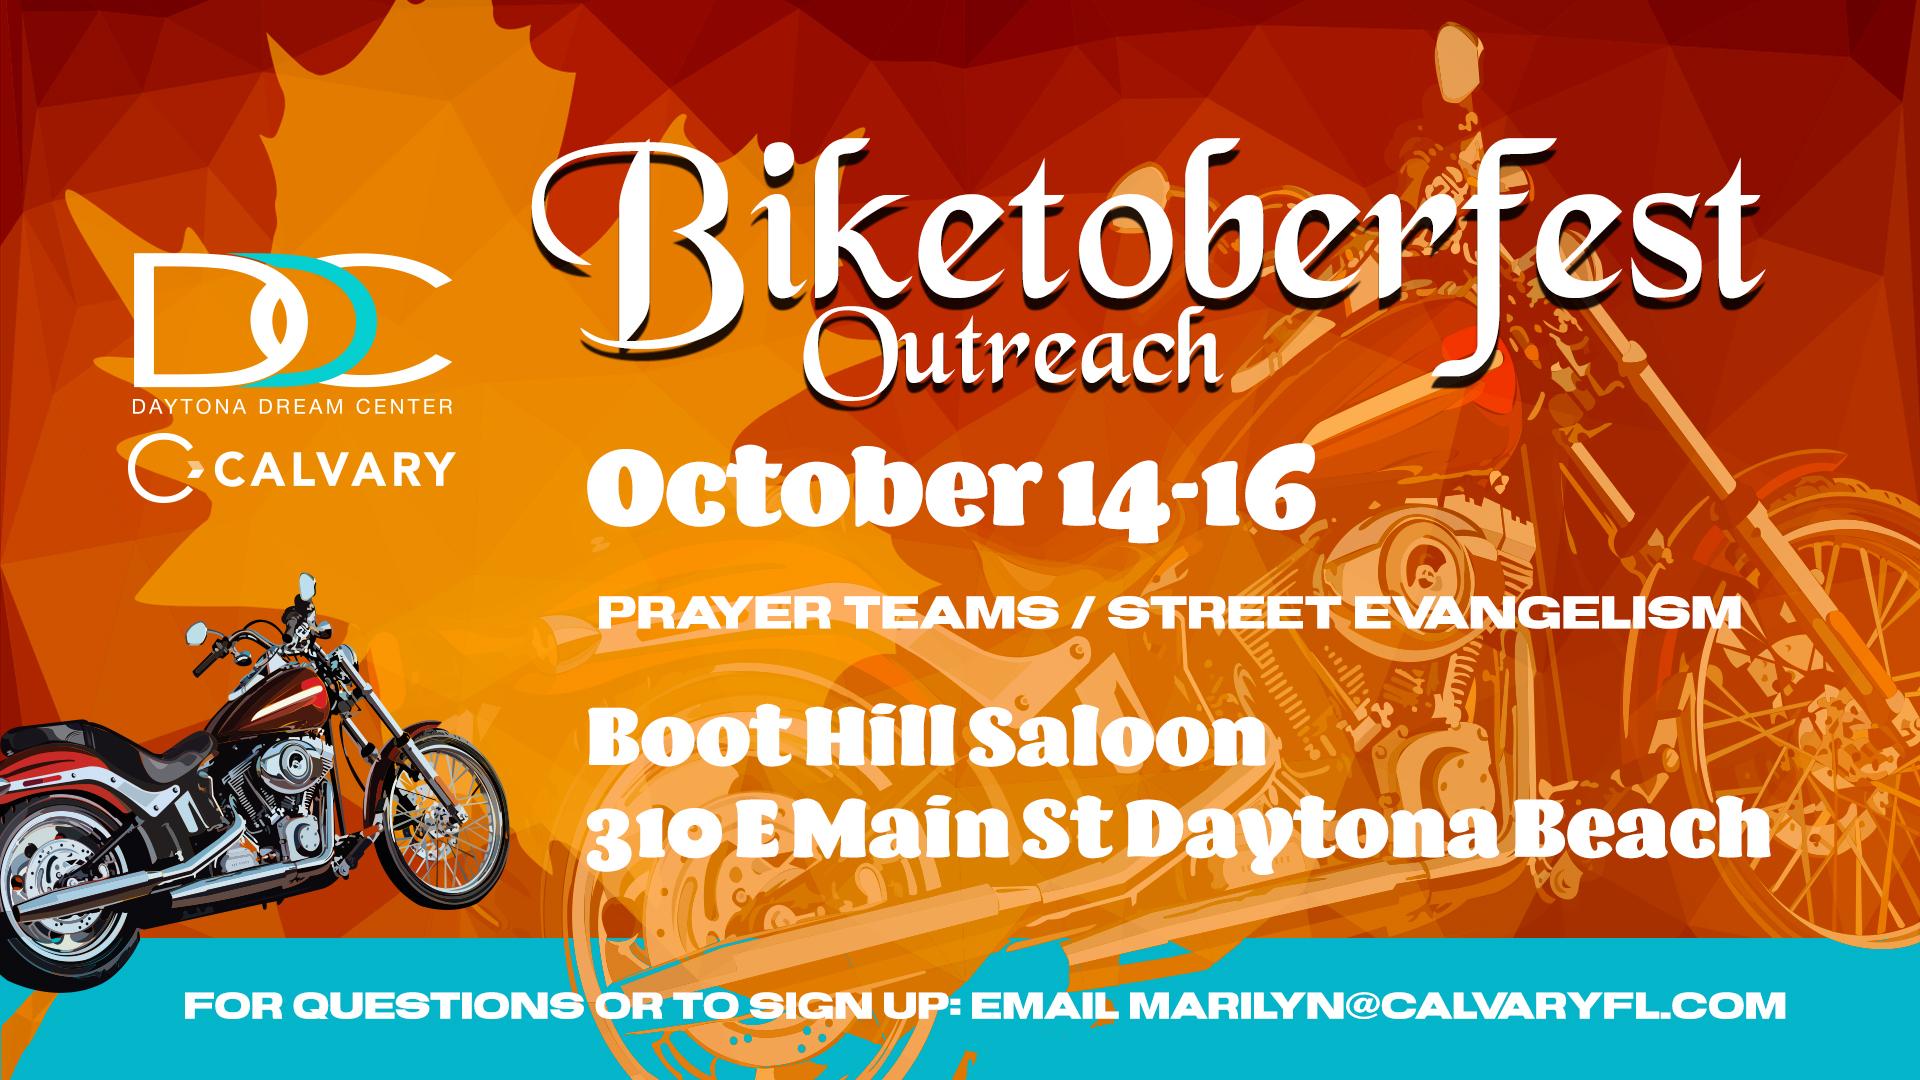 Biketoberfest - Daytona Dream Center - CalvaryFL